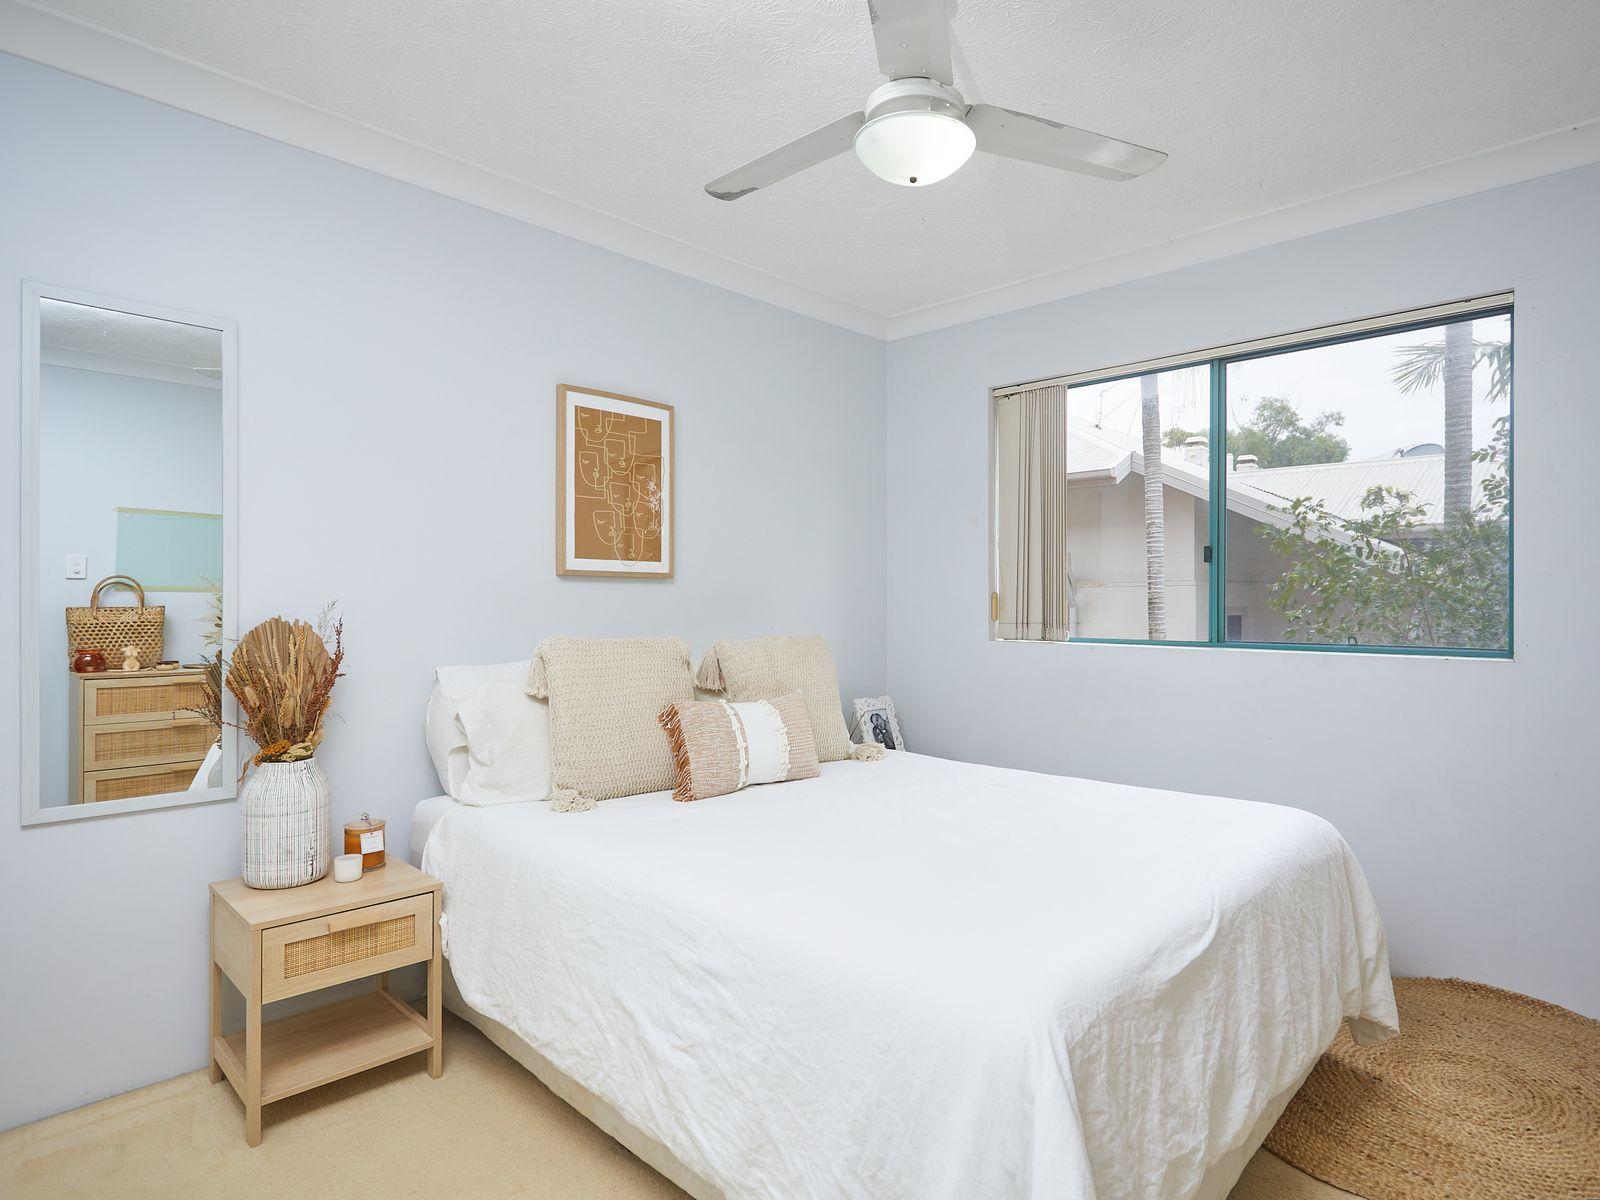 19/2340 Gold Coast Highway, Mermaid Beach, QLD 4218